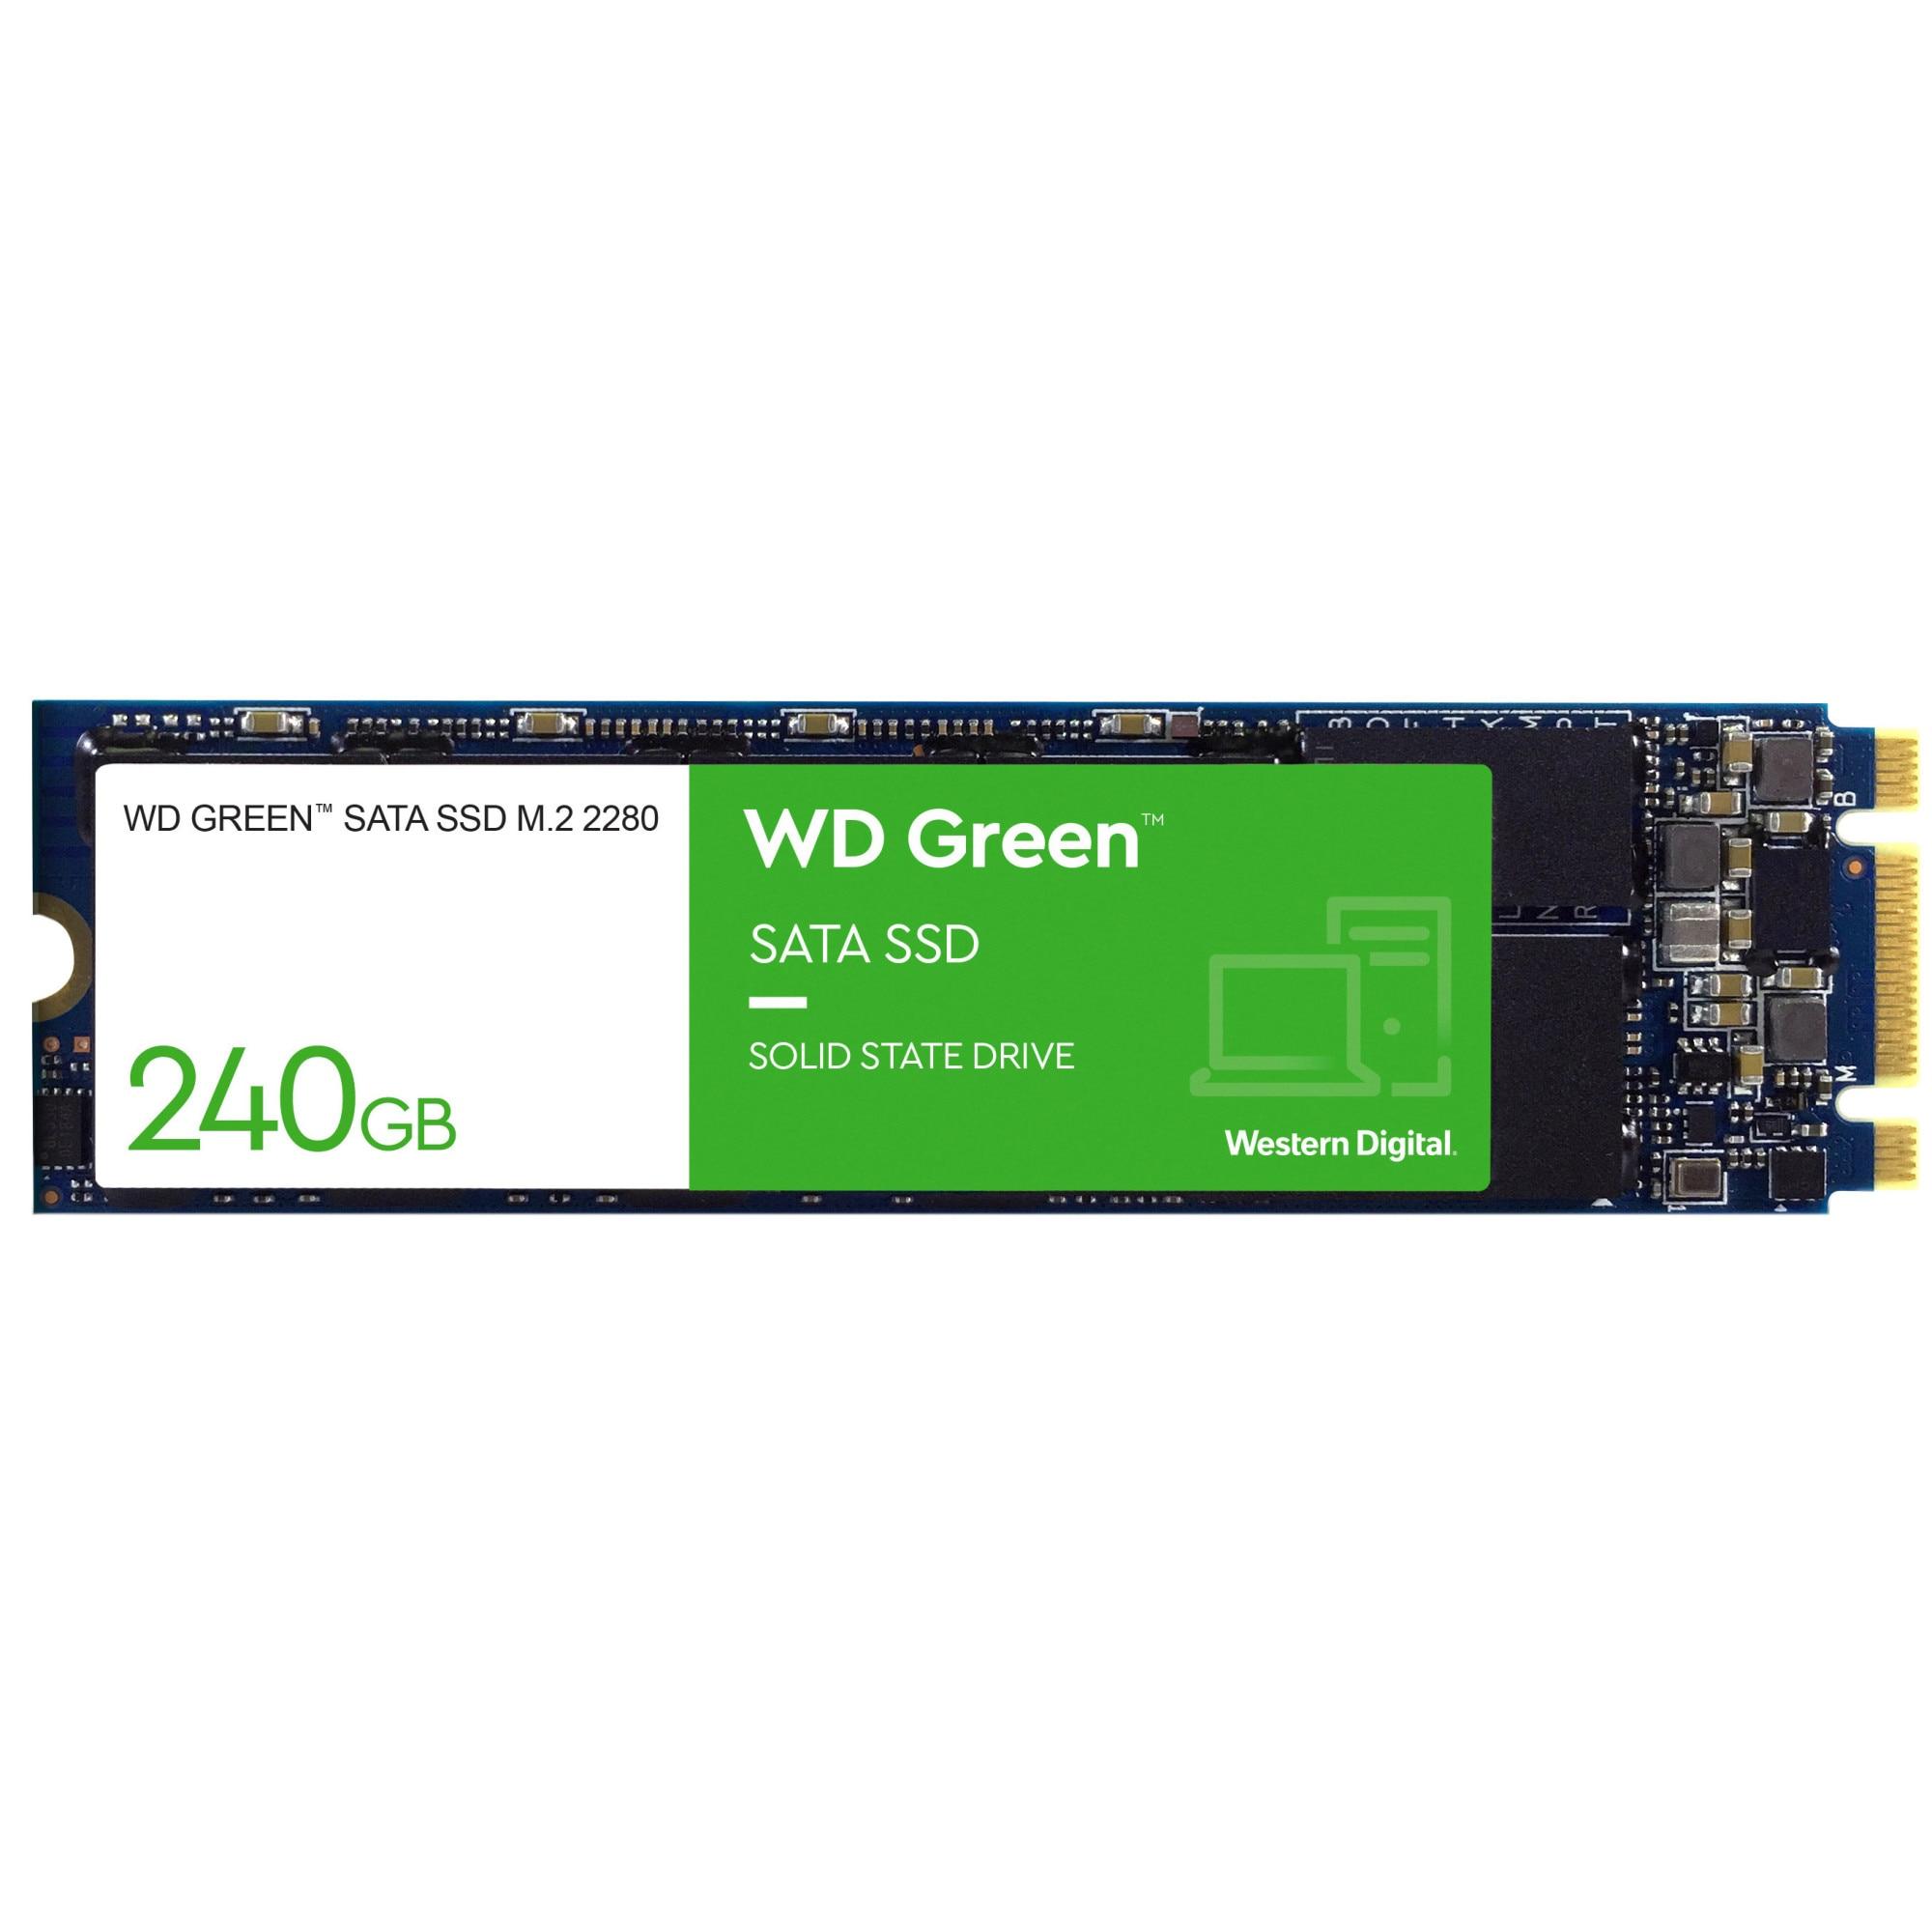 Fotografie Solid-state drive (SSD) WD, 240GB, Green, SATA3, M.2 2280